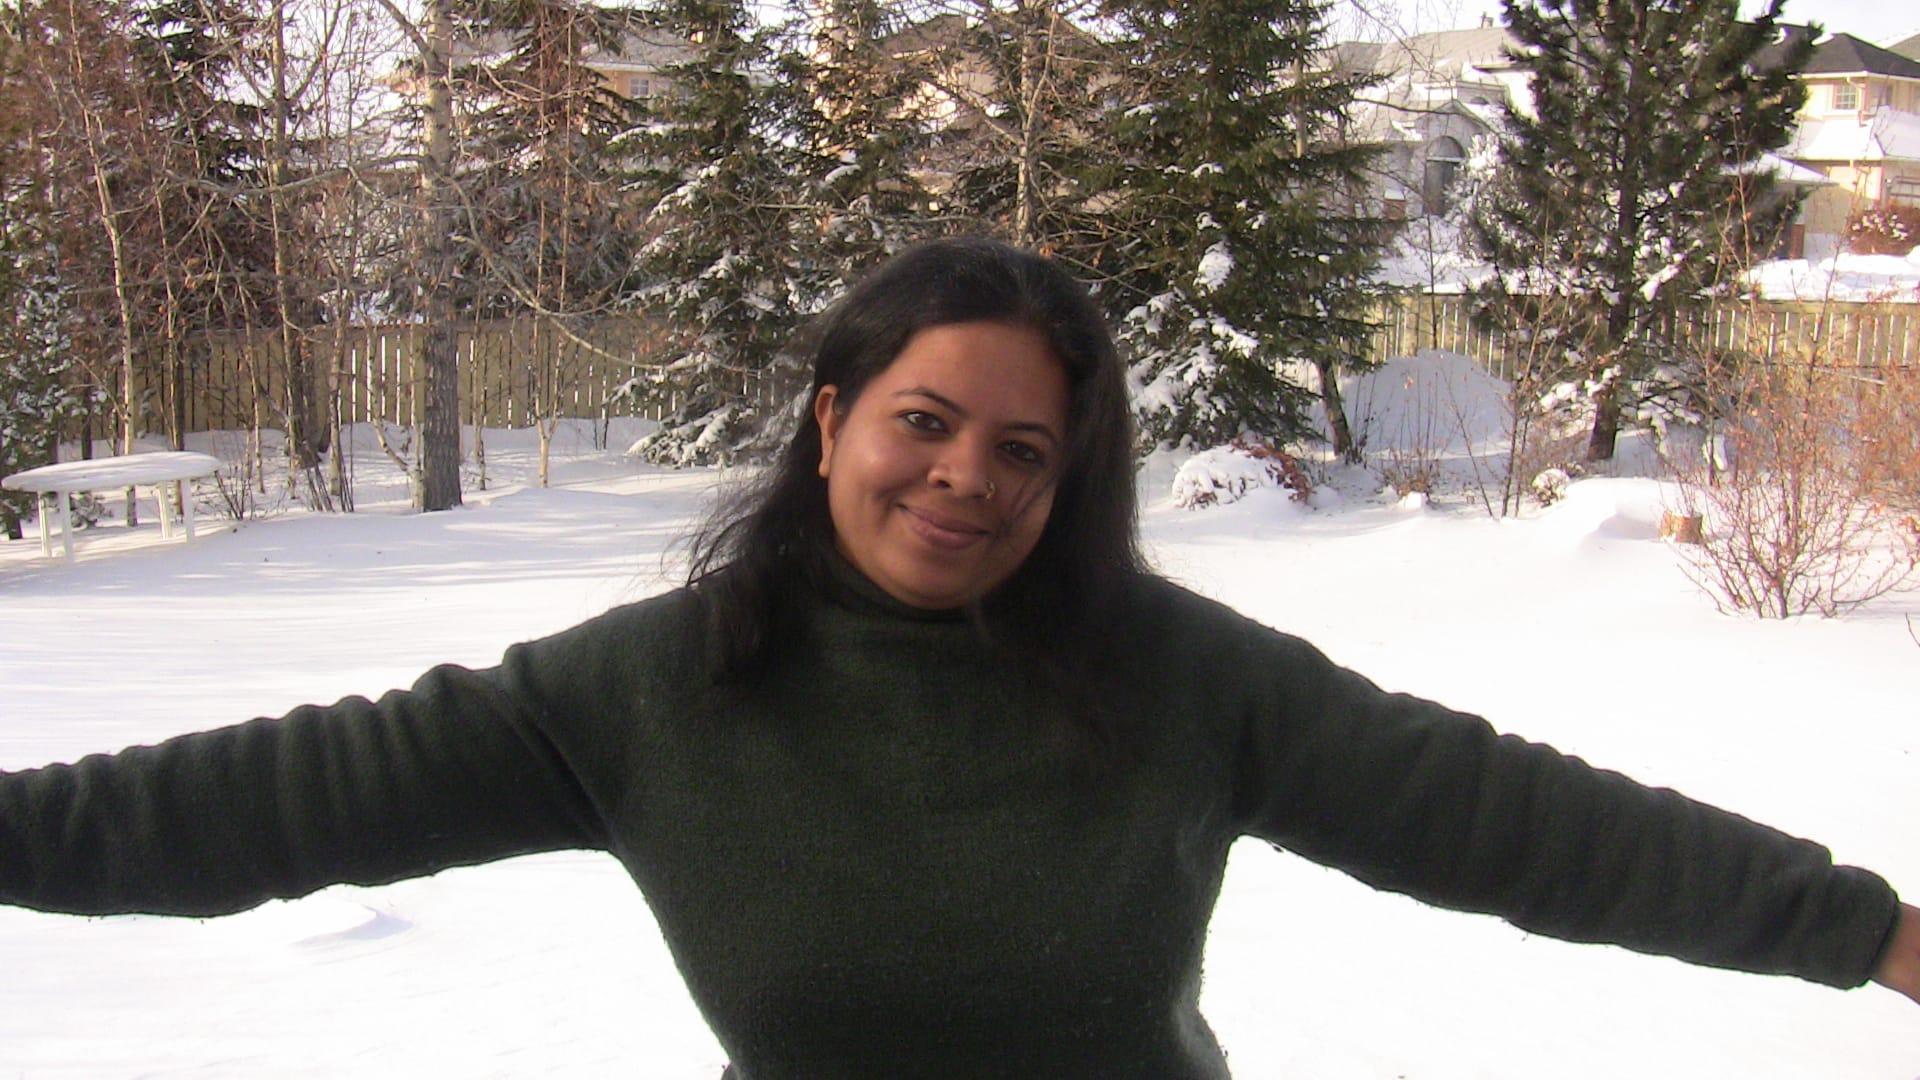 Anandita - Loving Calgary back